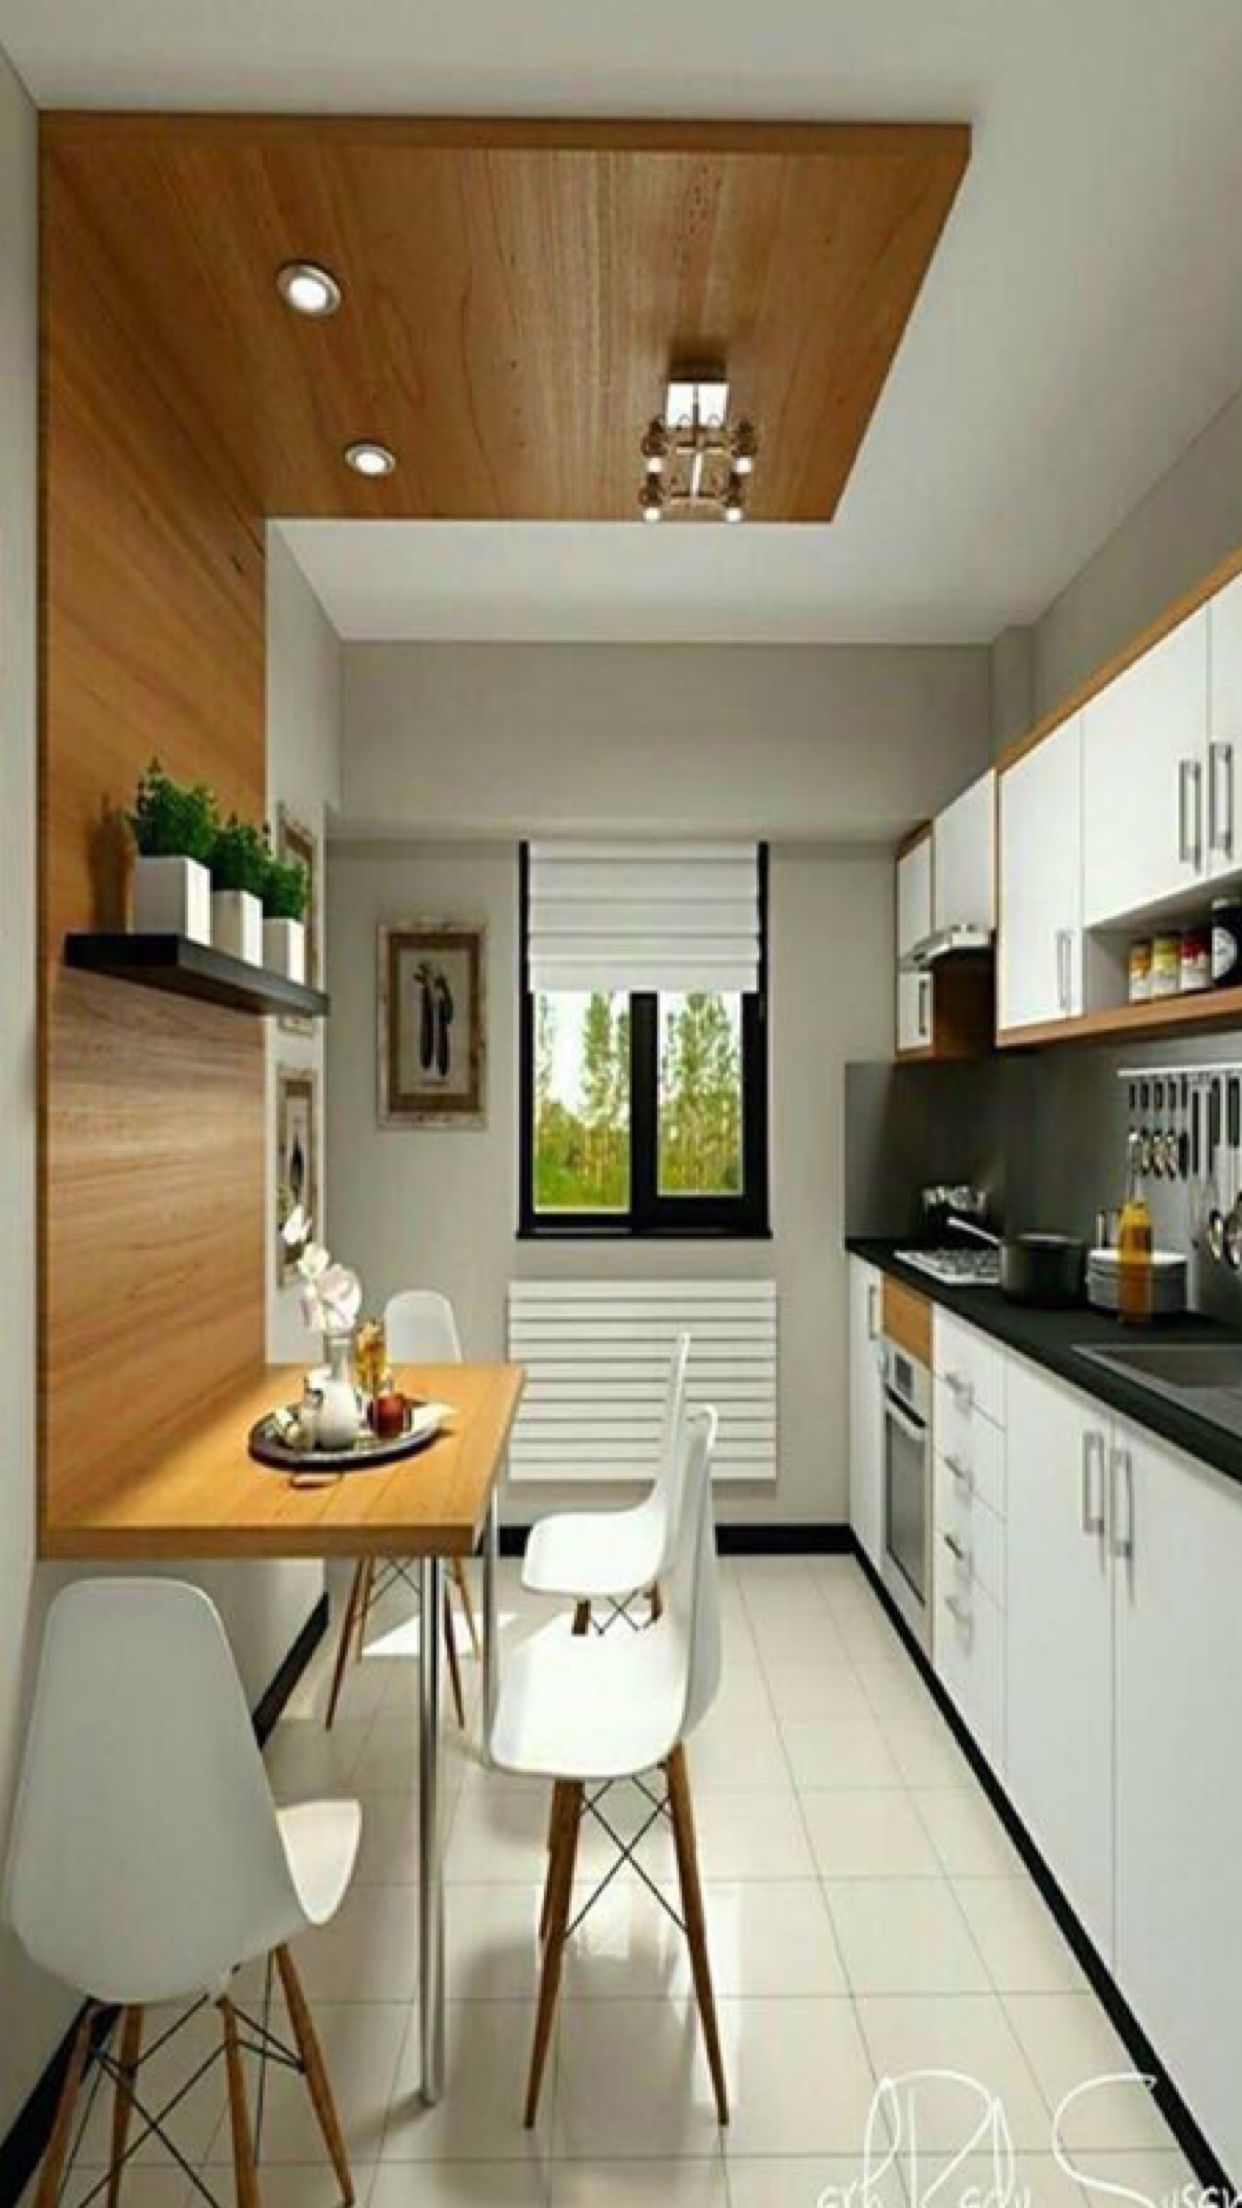 pindora0628 b on kitchen  kitchen design small